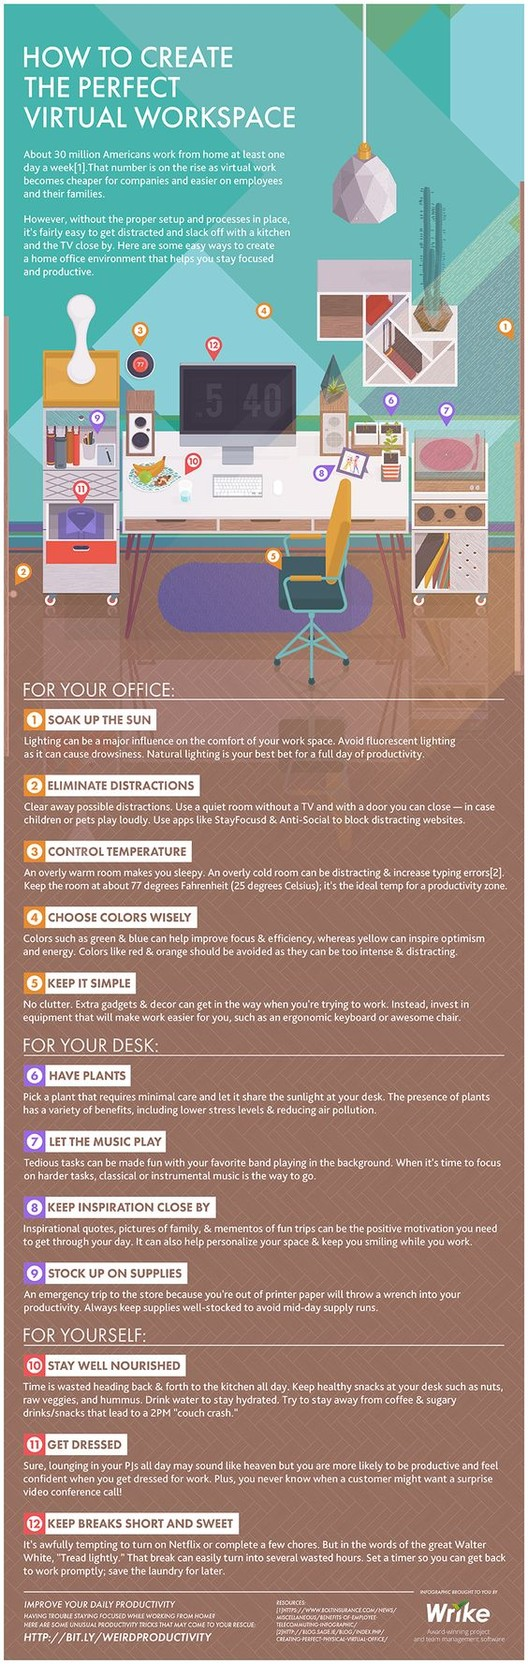 <a href='https://www.wrike.com/blog/create-perfect-remote-work-environment-infographic/'> Wrike / via Pinterest</a>